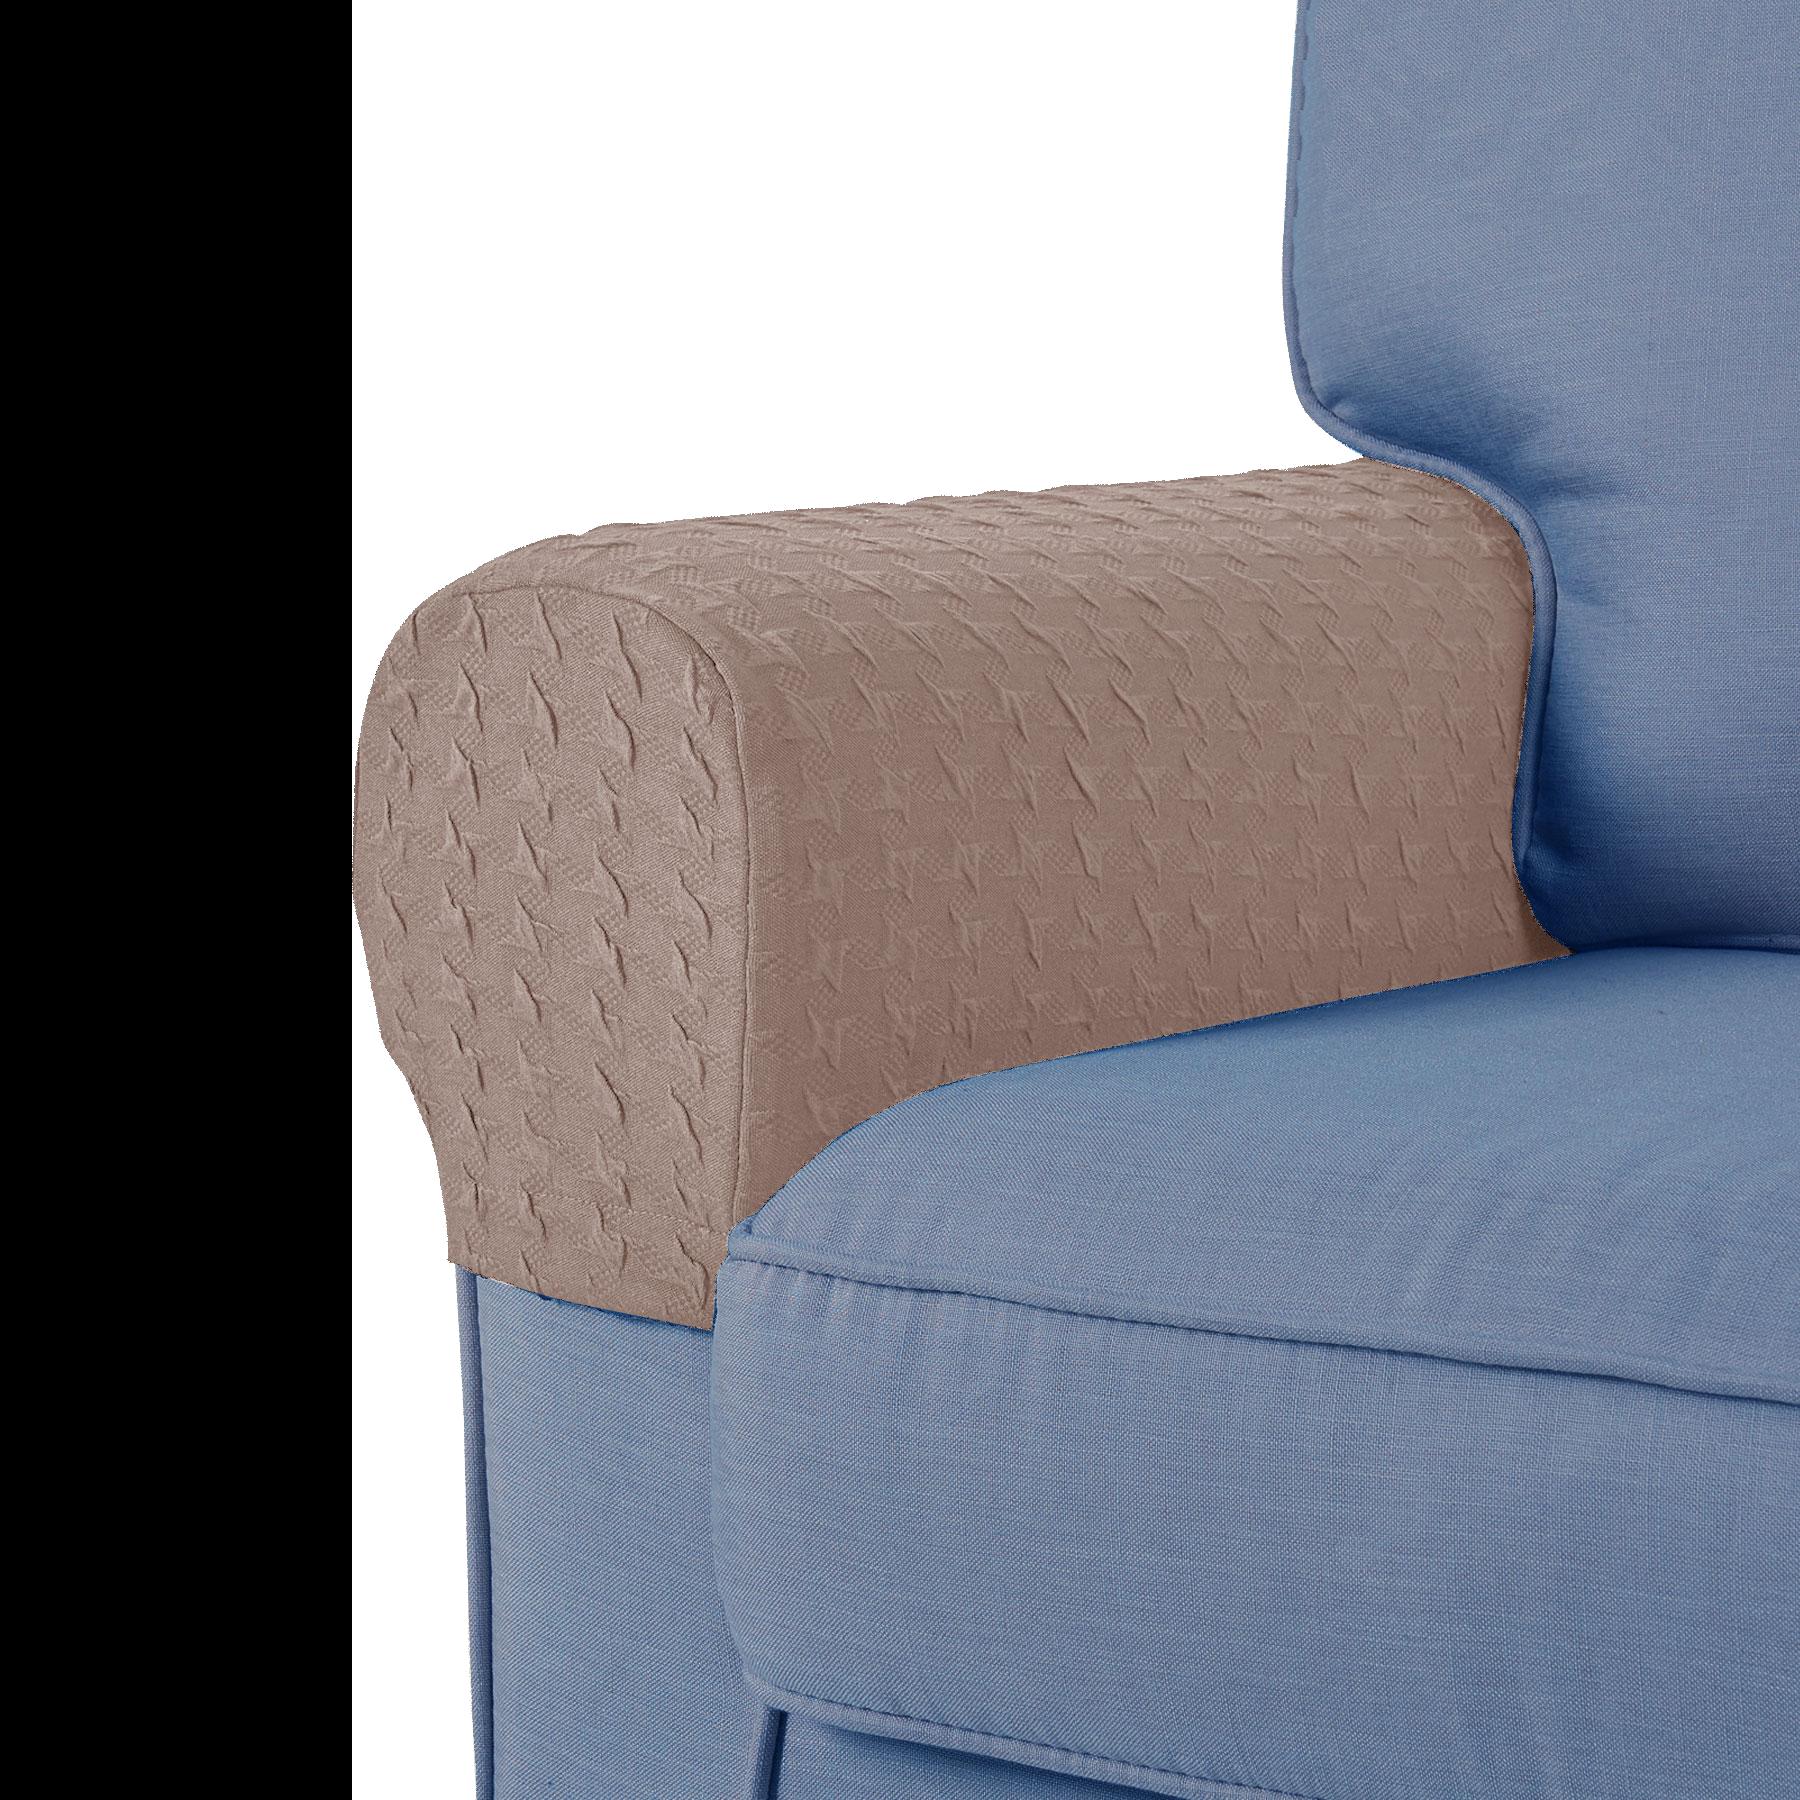 Tremendous Stretch Sofa Arm Covers Paper Crane Jacquard Pattern Set Of Pabps2019 Chair Design Images Pabps2019Com